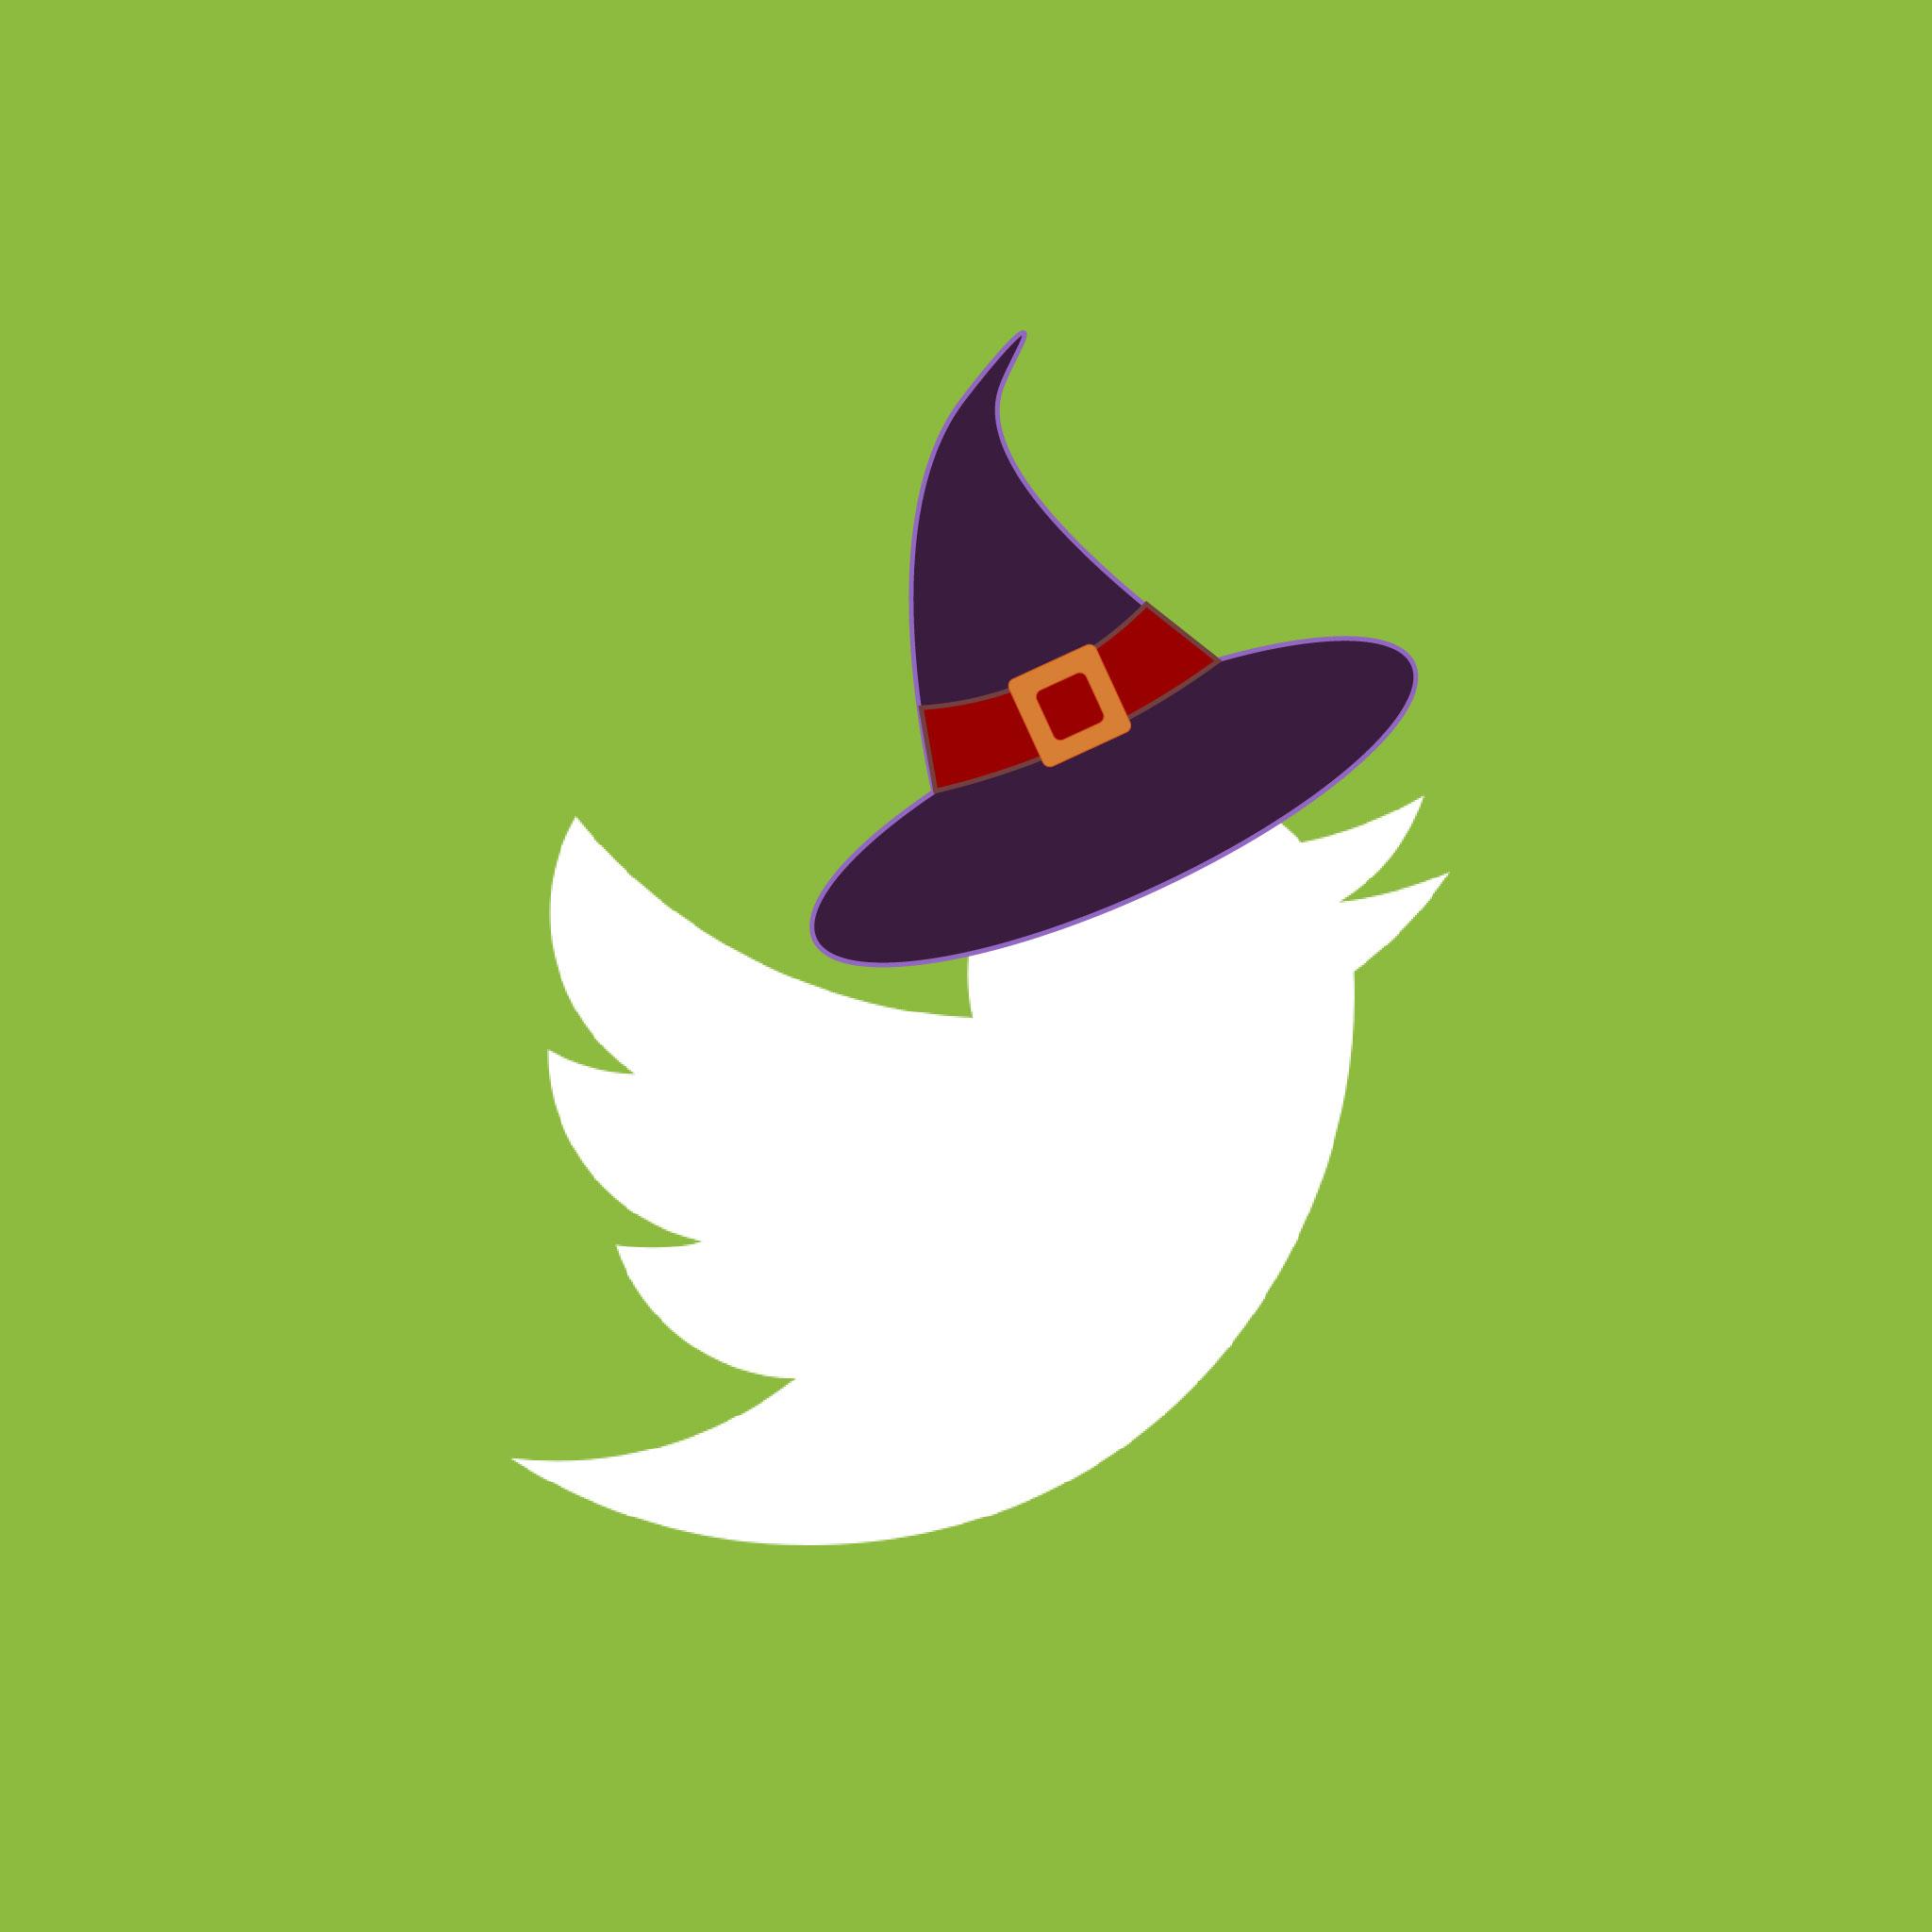 Twitter Halloween App Icon from HalloweenCostumes.com